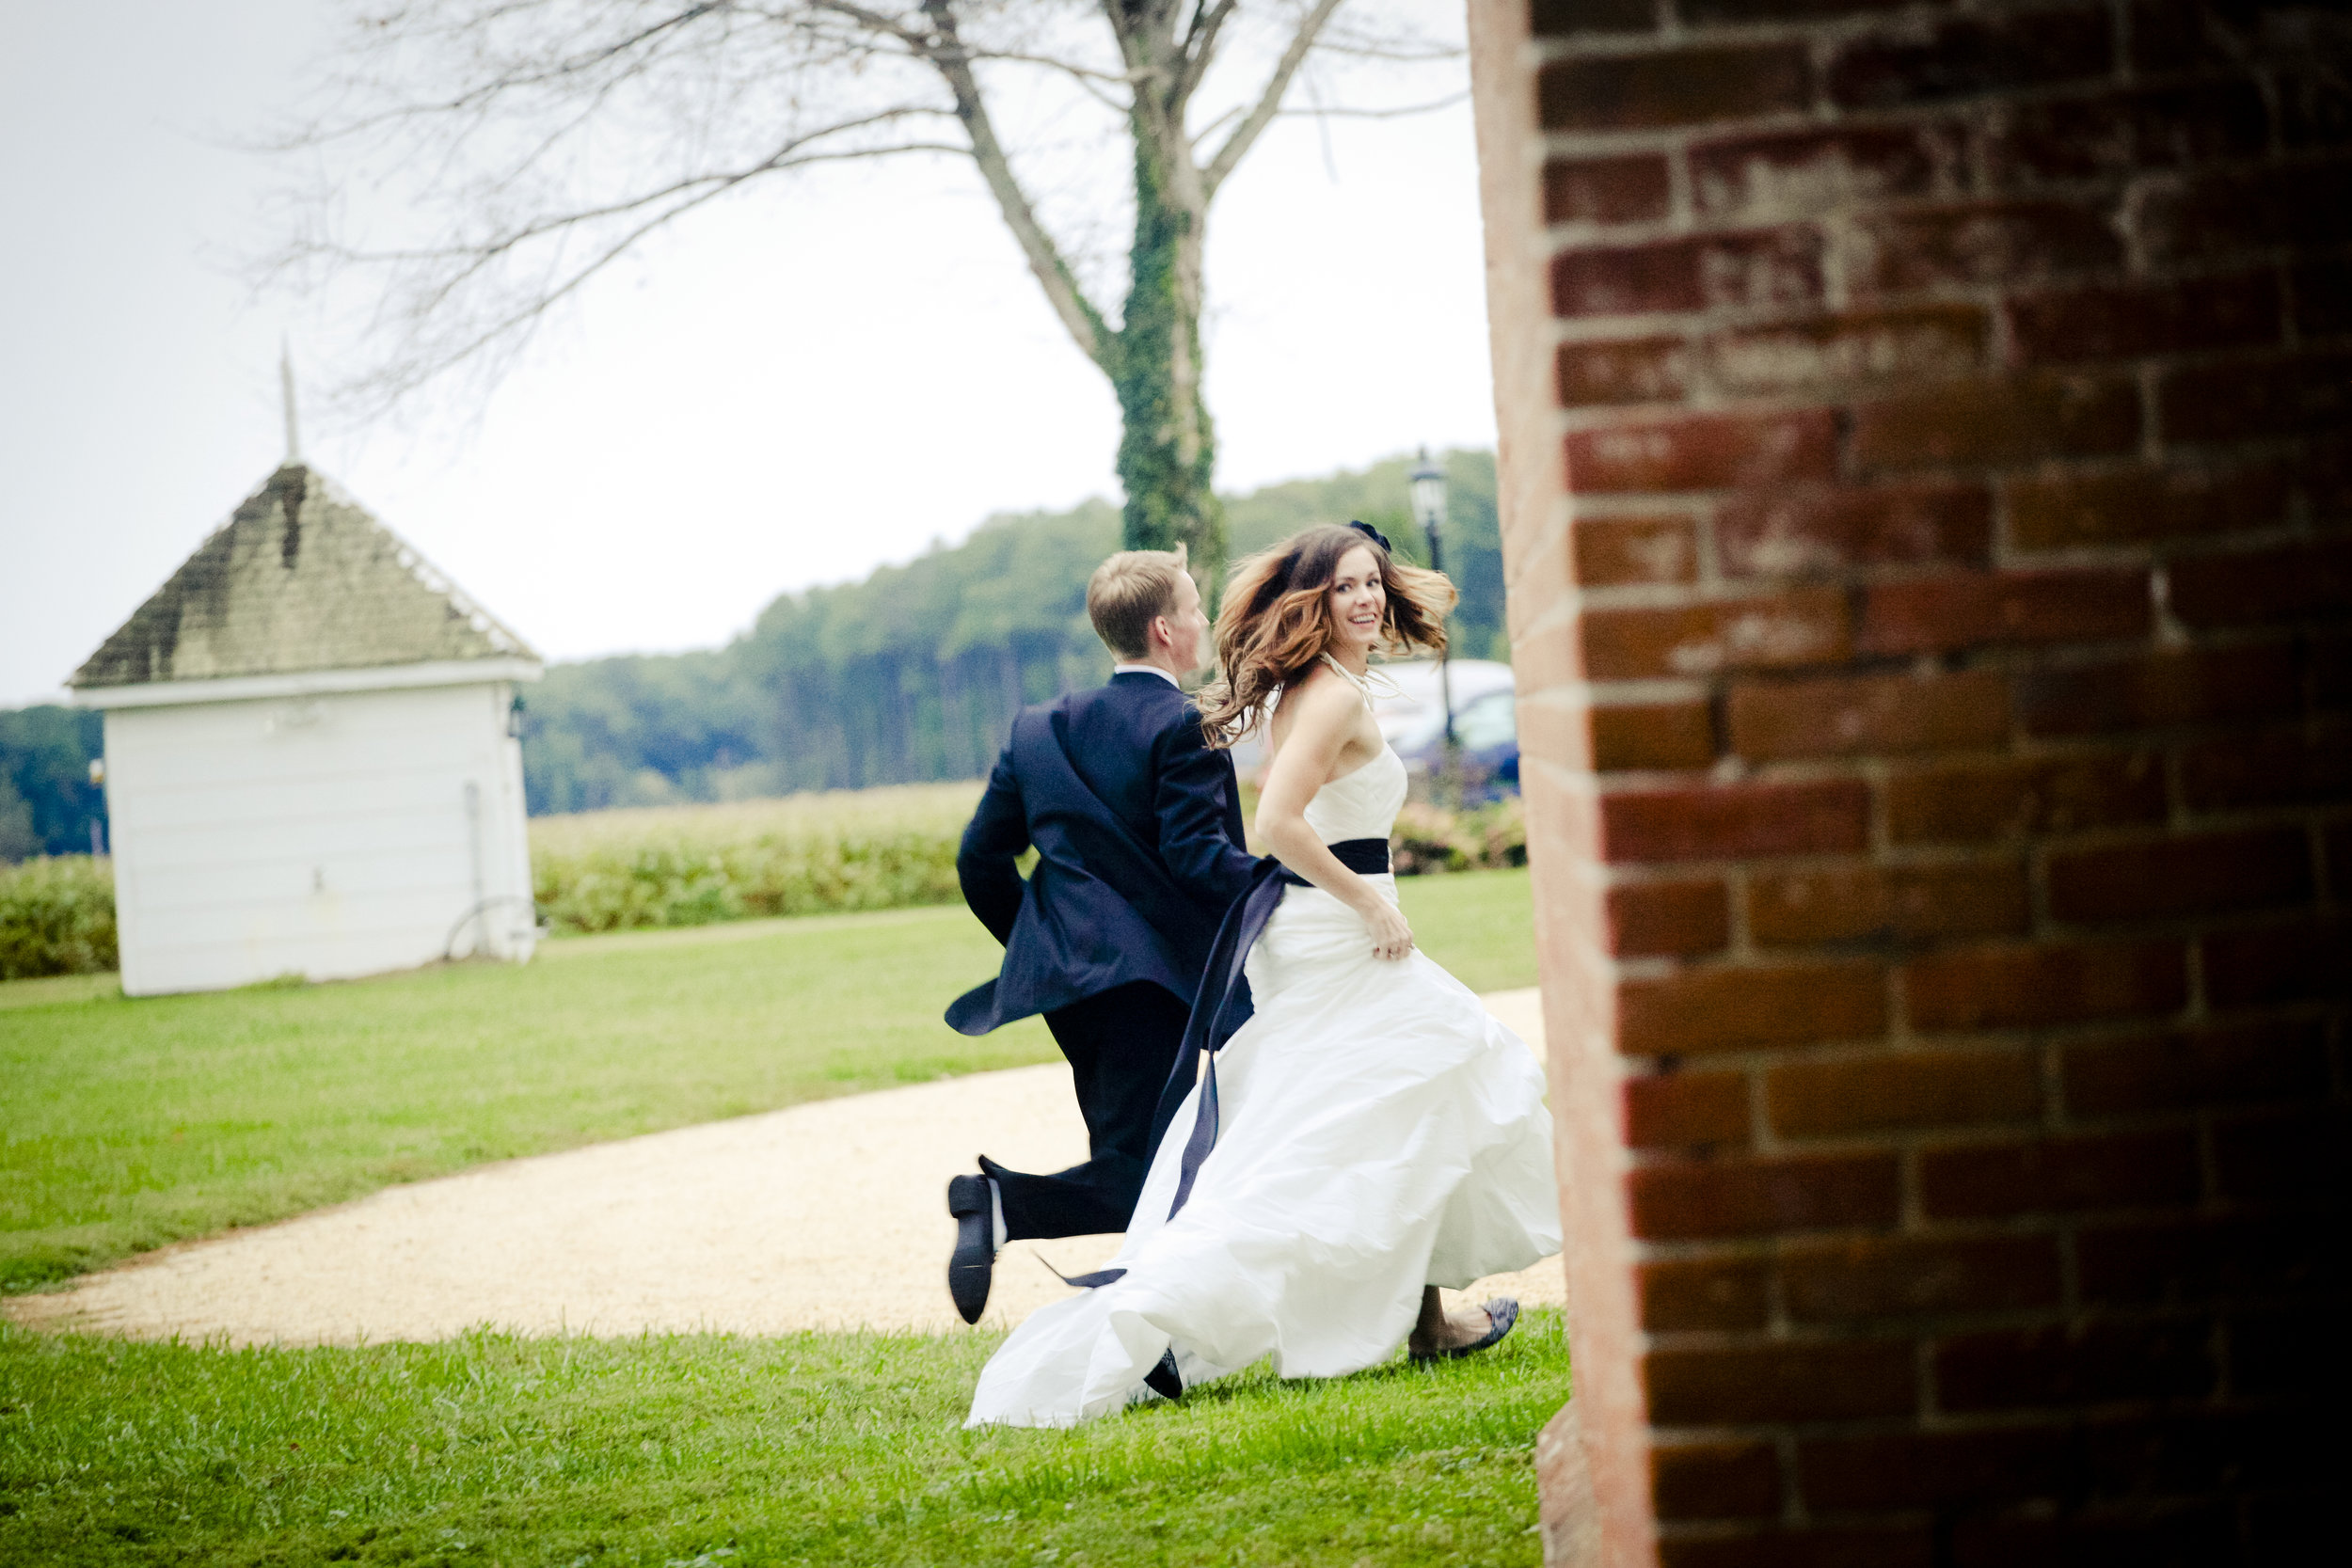 0019_100712 141 metcalf wedding edited.JPG